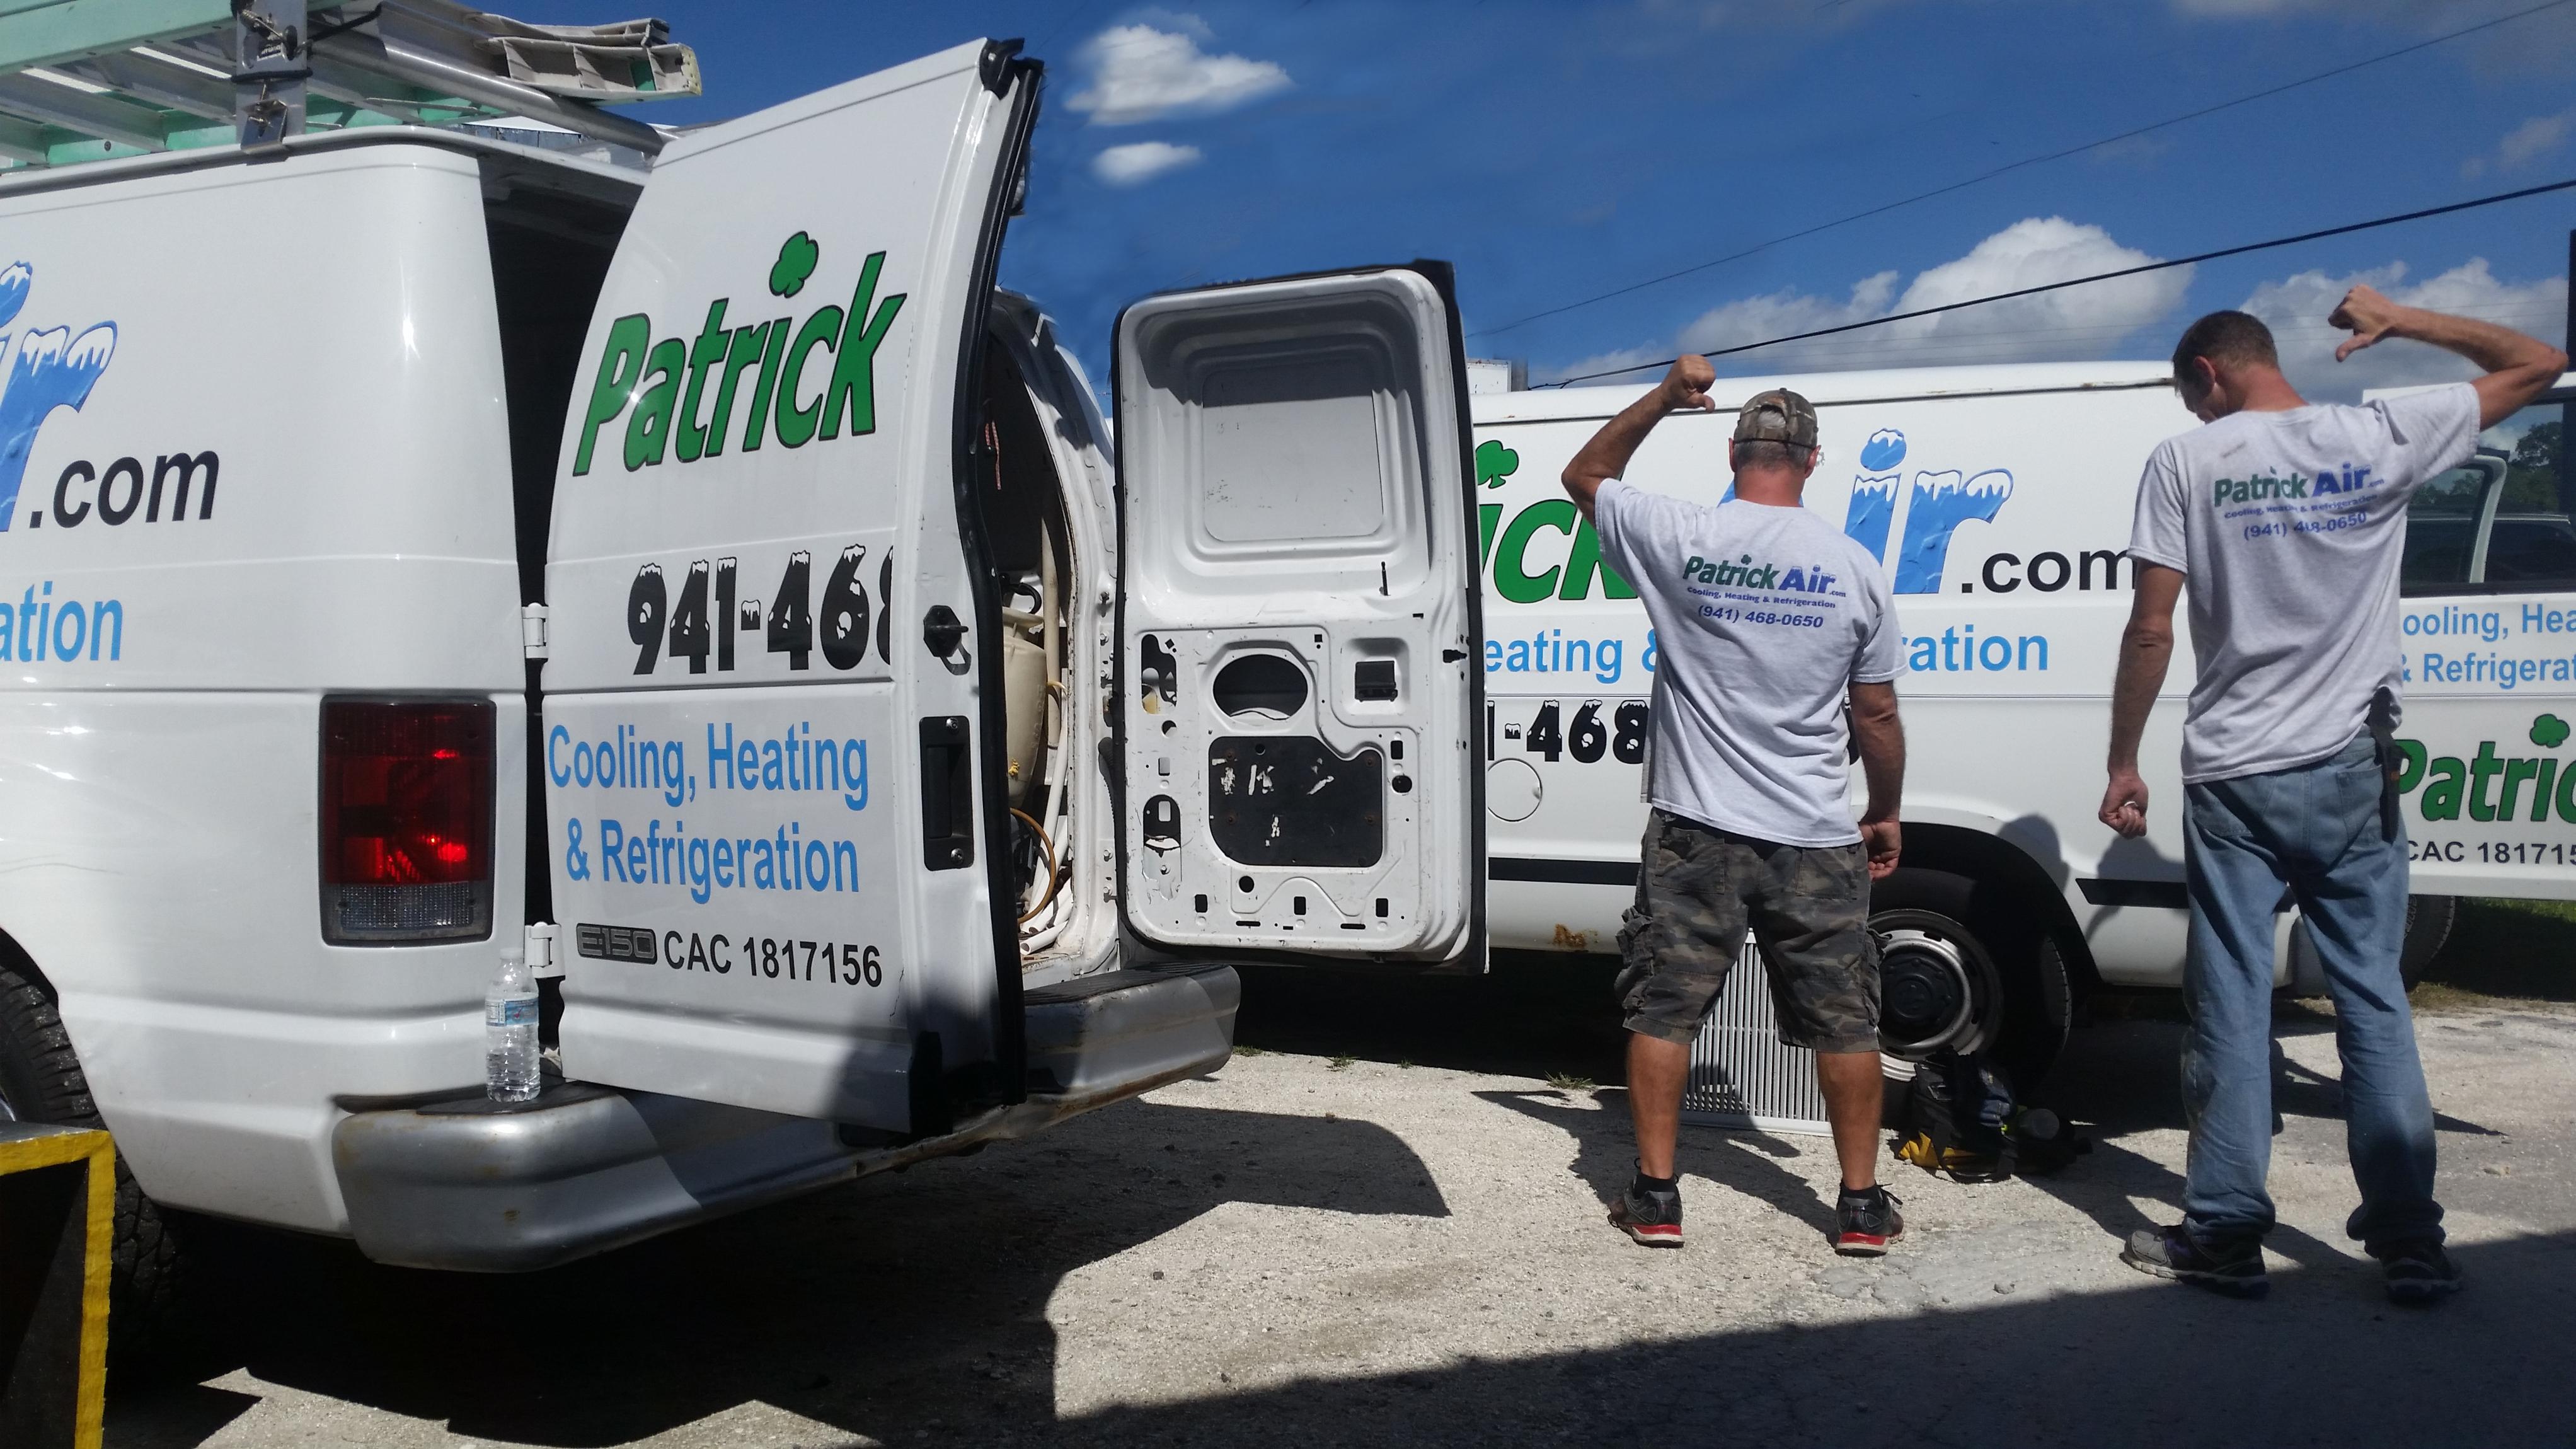 PatrickAir Cooling, Heating & Refrigeration Contractor in Venice, FL